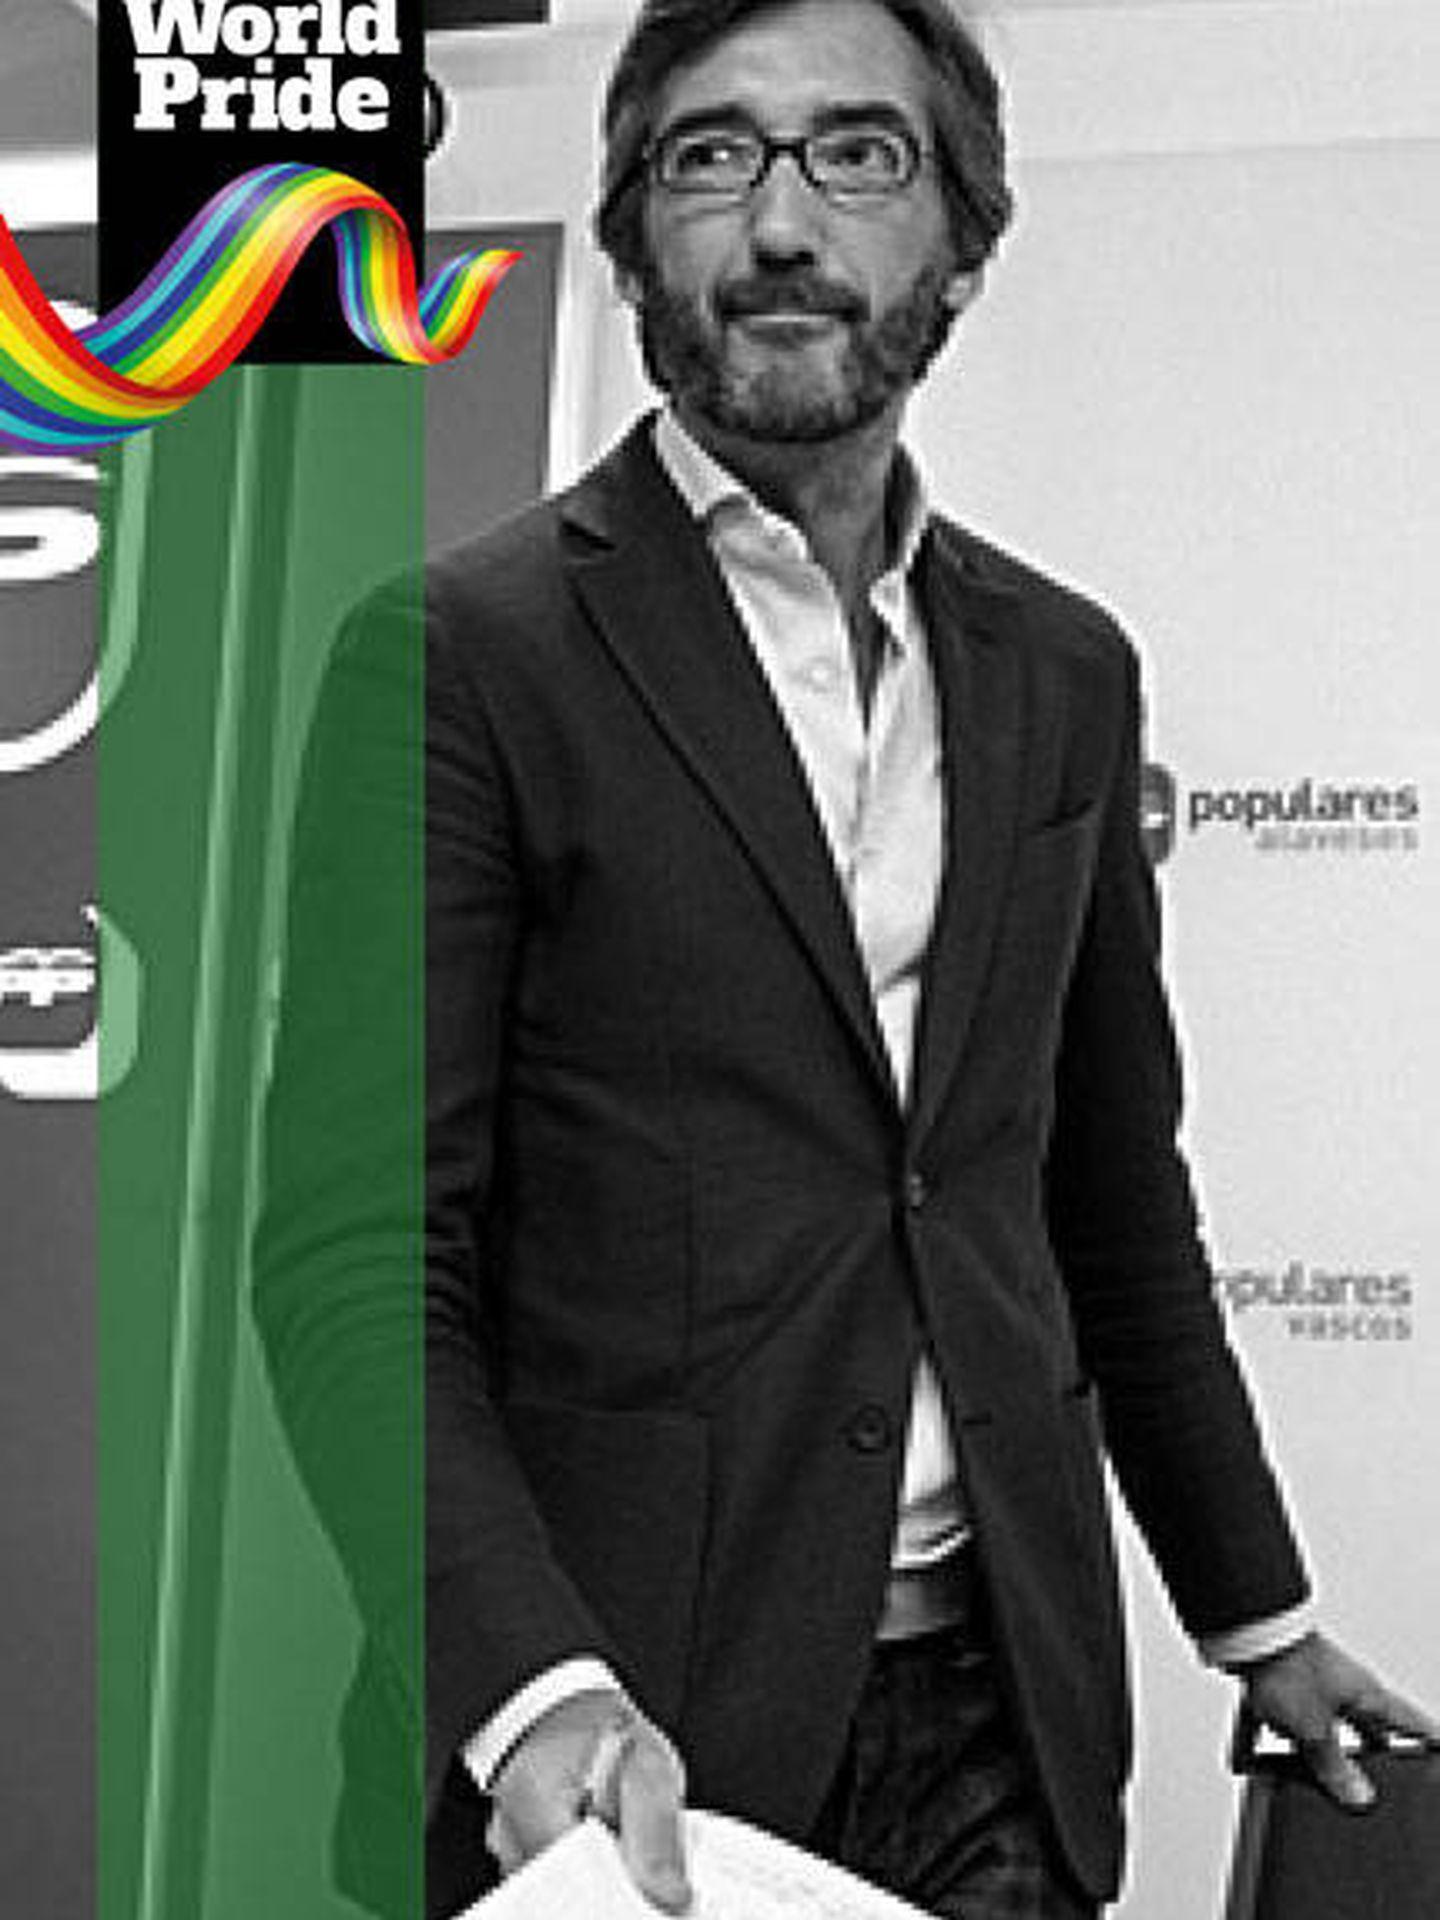 Orgullo LGTBI 2017: Iñaki Oyarzabal.